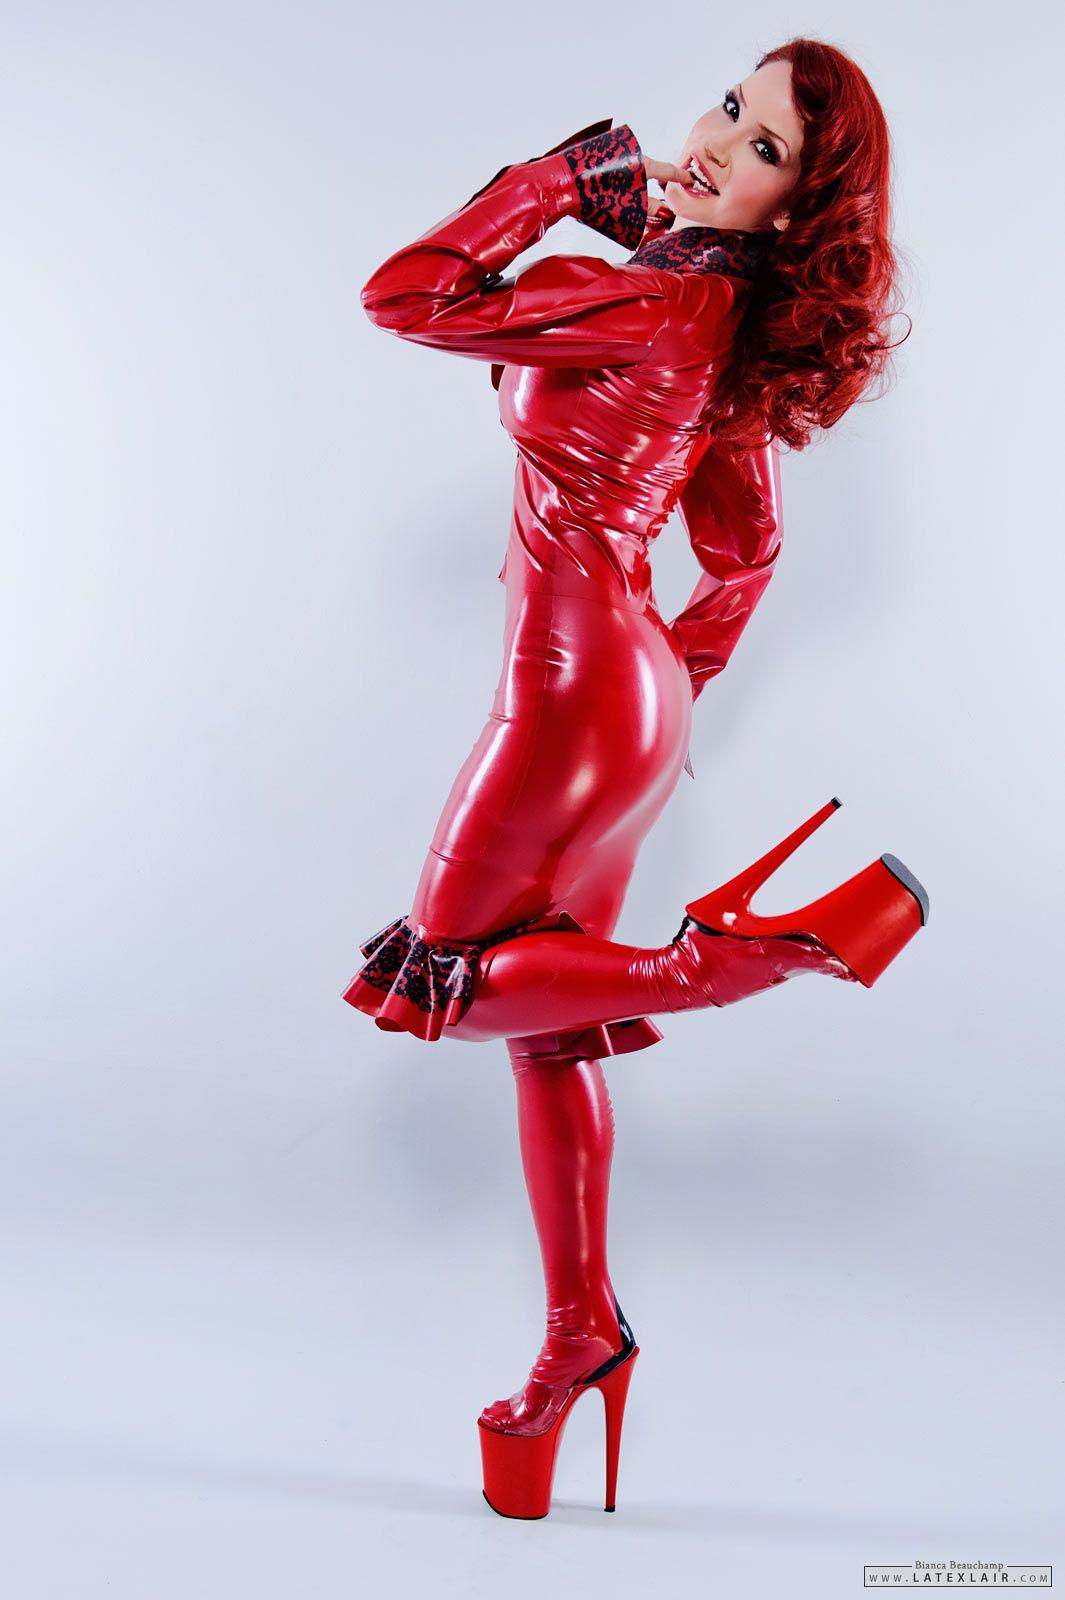 bianca latex fetish - Latex Fetish Love - Shiny frills girl in a red latex